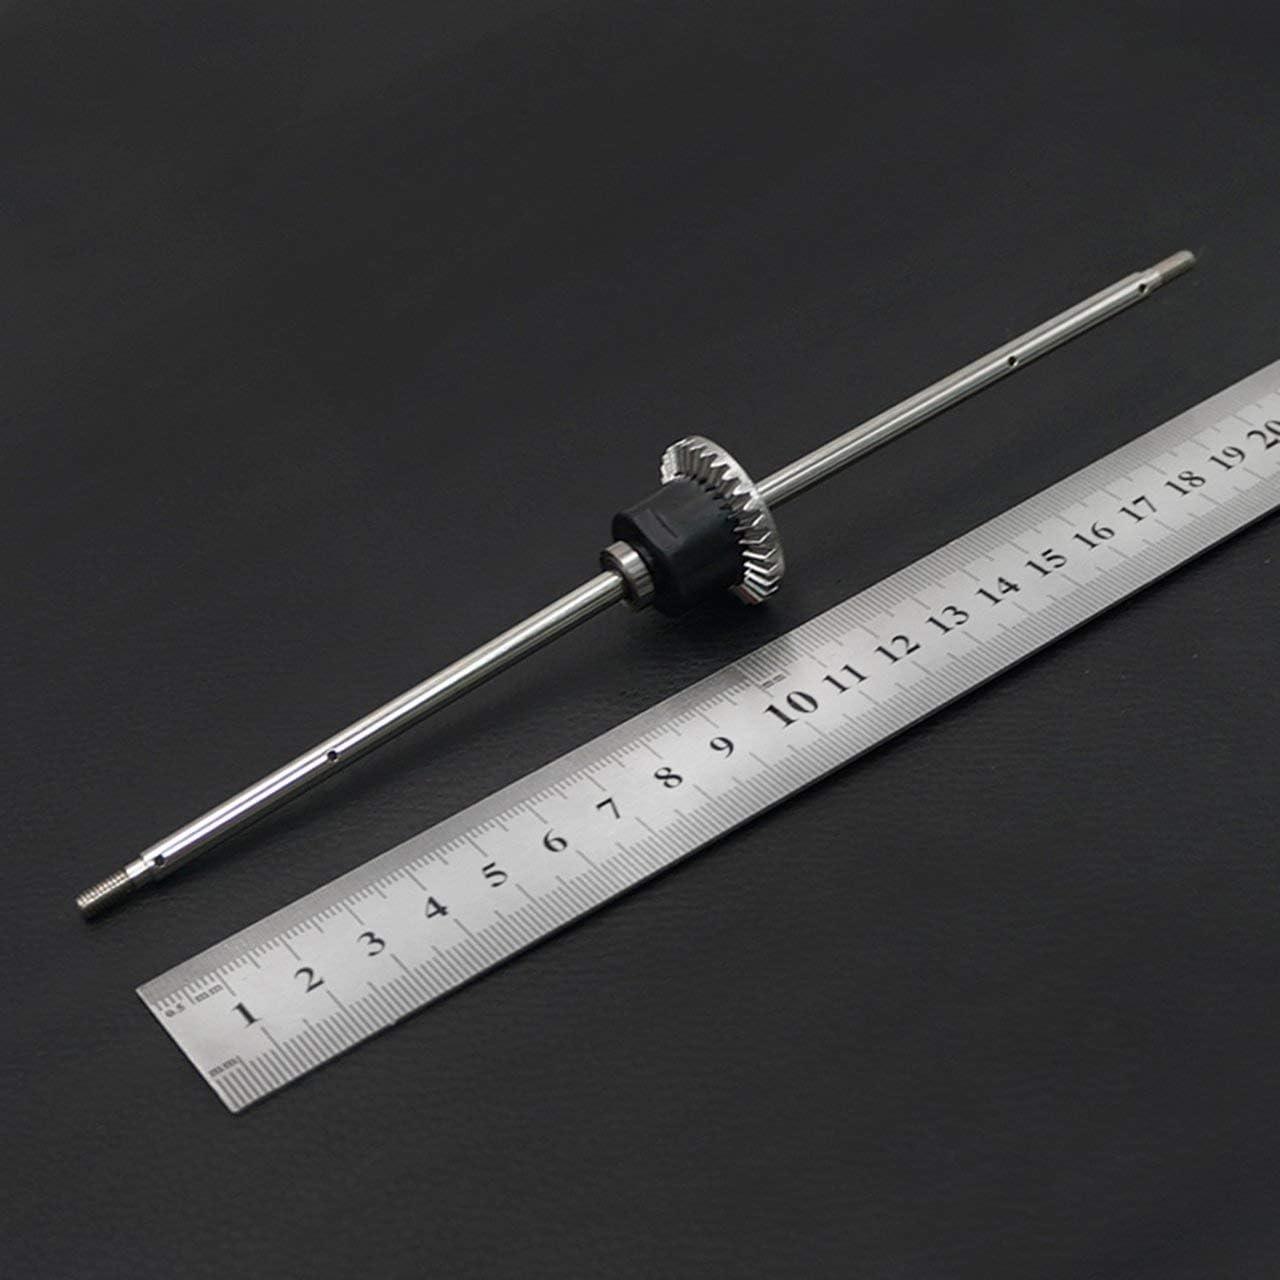 F/ür WLtoys 12428 1//12 Rear Differential Gears Set komplett Upgrades Car RC Modellbau Modellersatzteile Zubeh/ör DEjasnyfall Silber